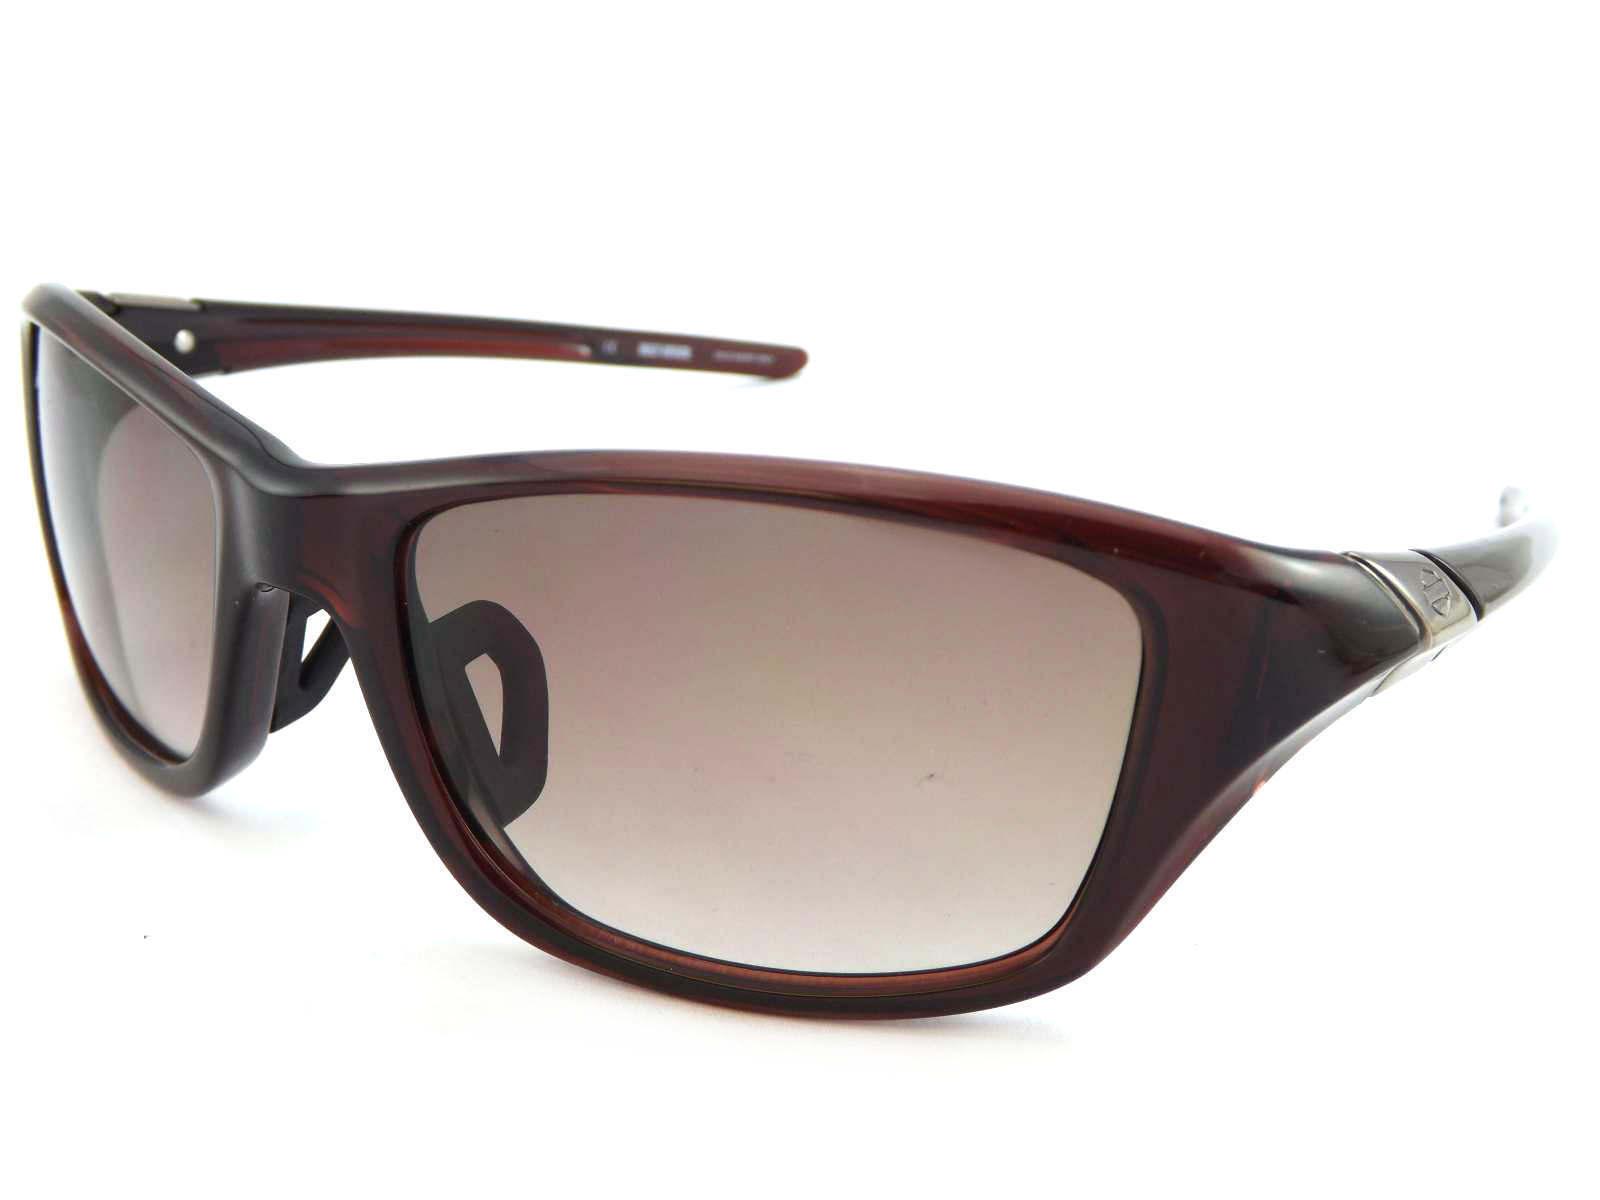 Harley Davidson Shiny Brown Polarised Wraparound Style Sunglasses with Case